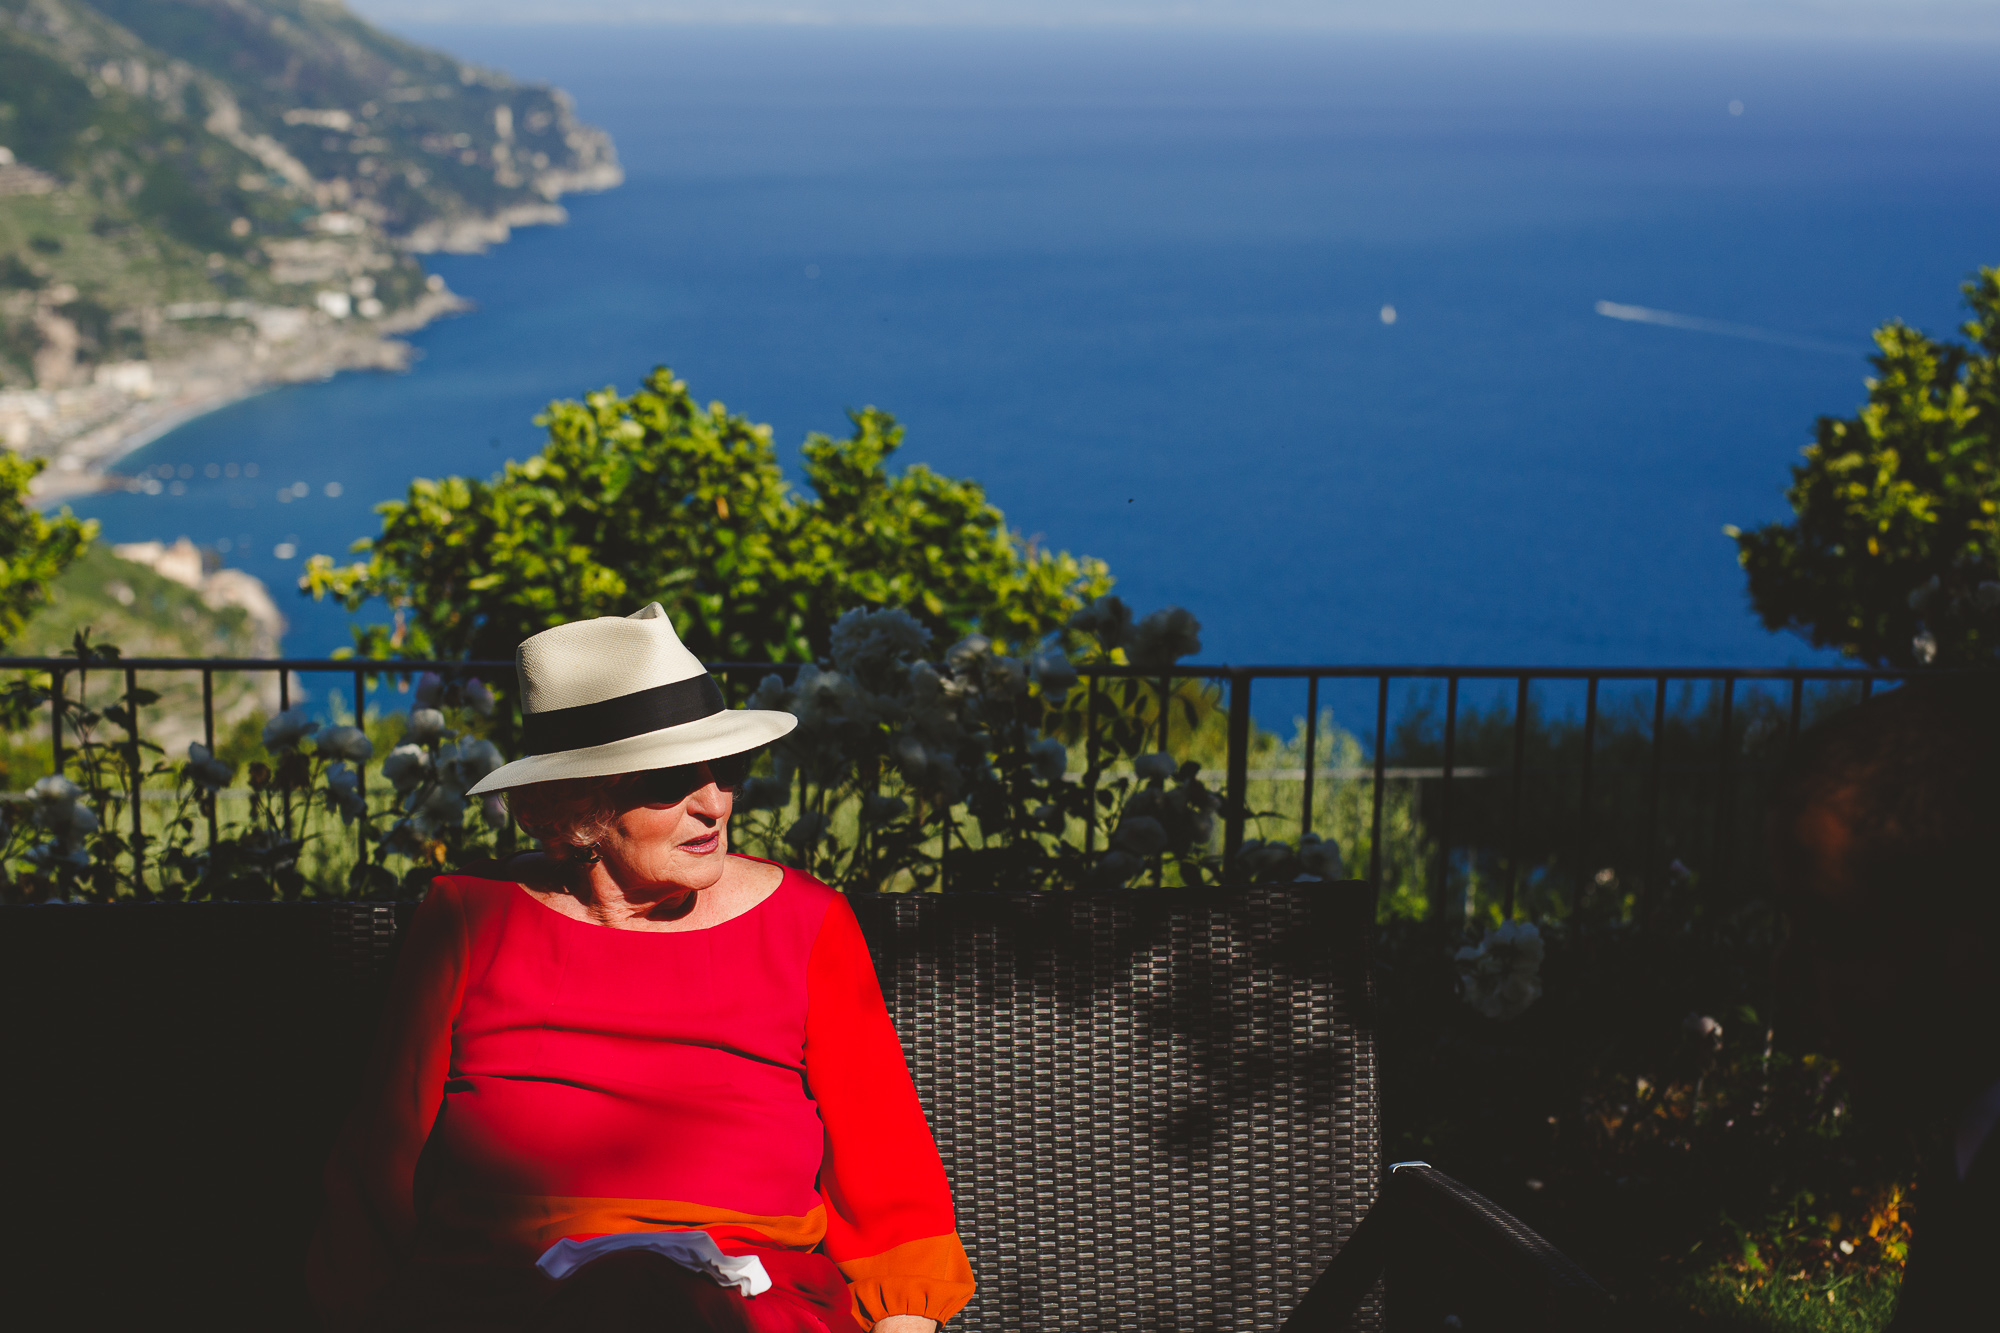 destination-wedding-photography-amalfi-coast-ravello-9.jpg